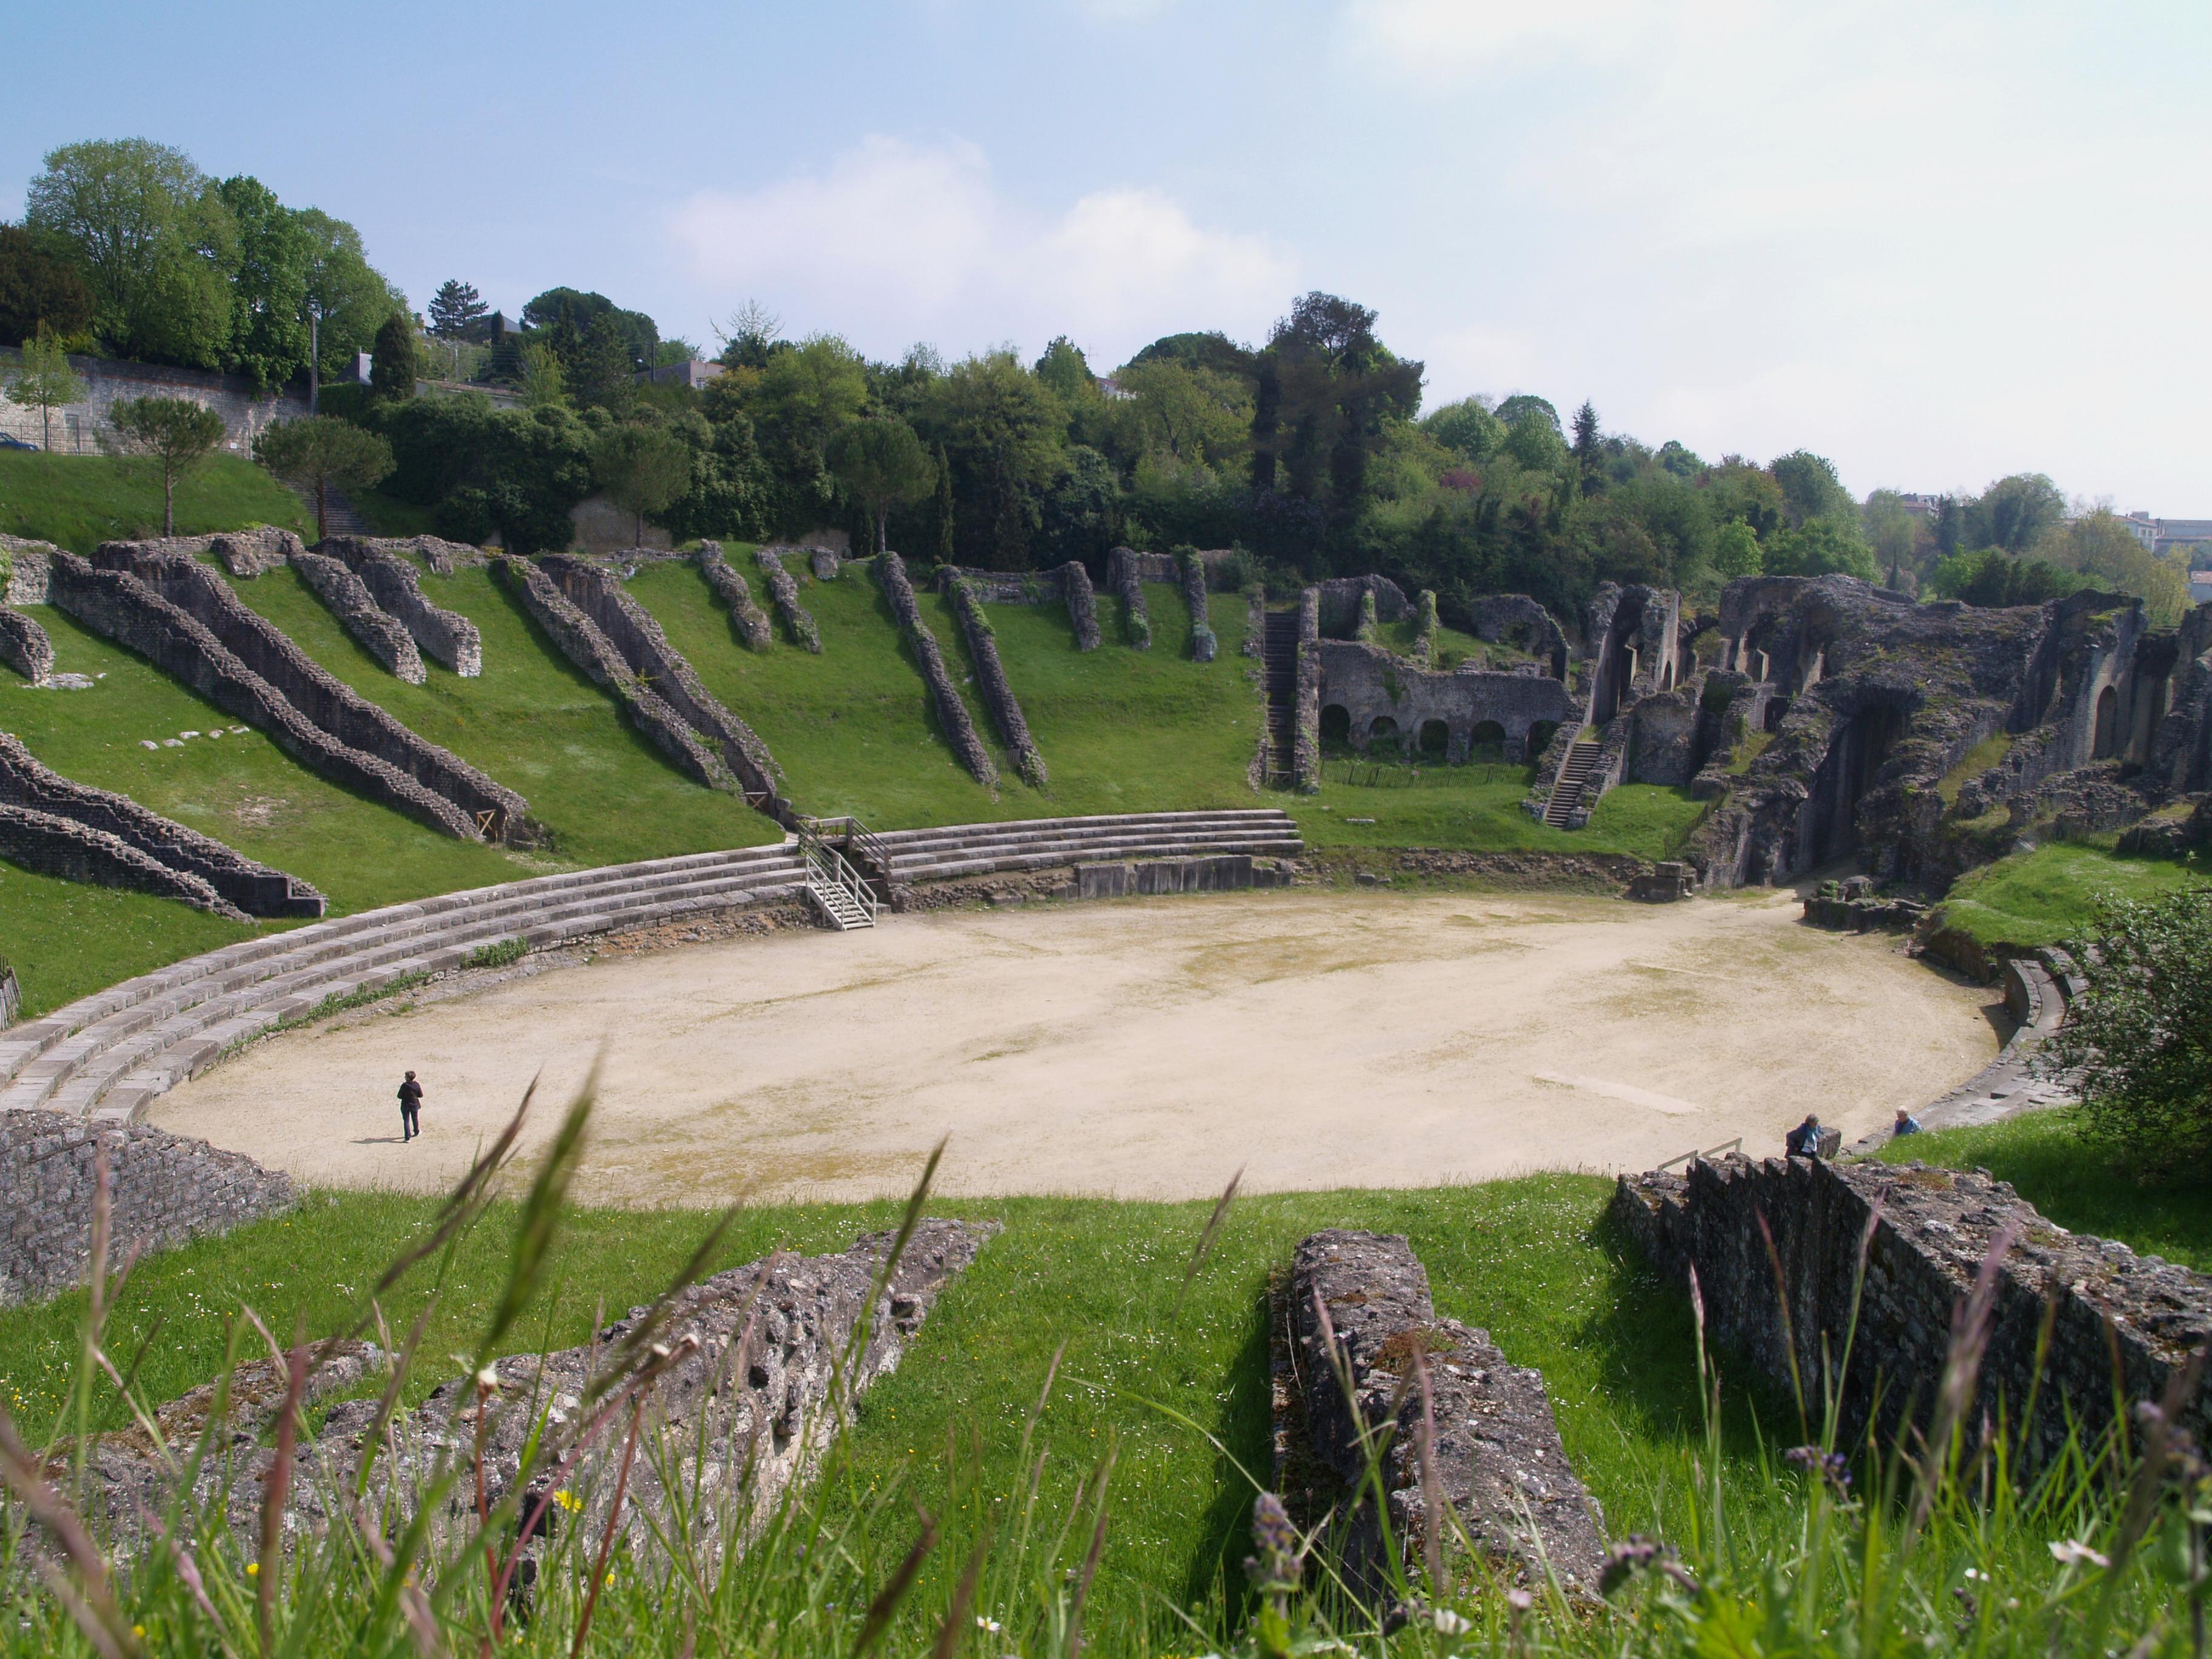 Saintes France  City new picture : Saintes amphitheatre Wikipedia, the free encyclopedia